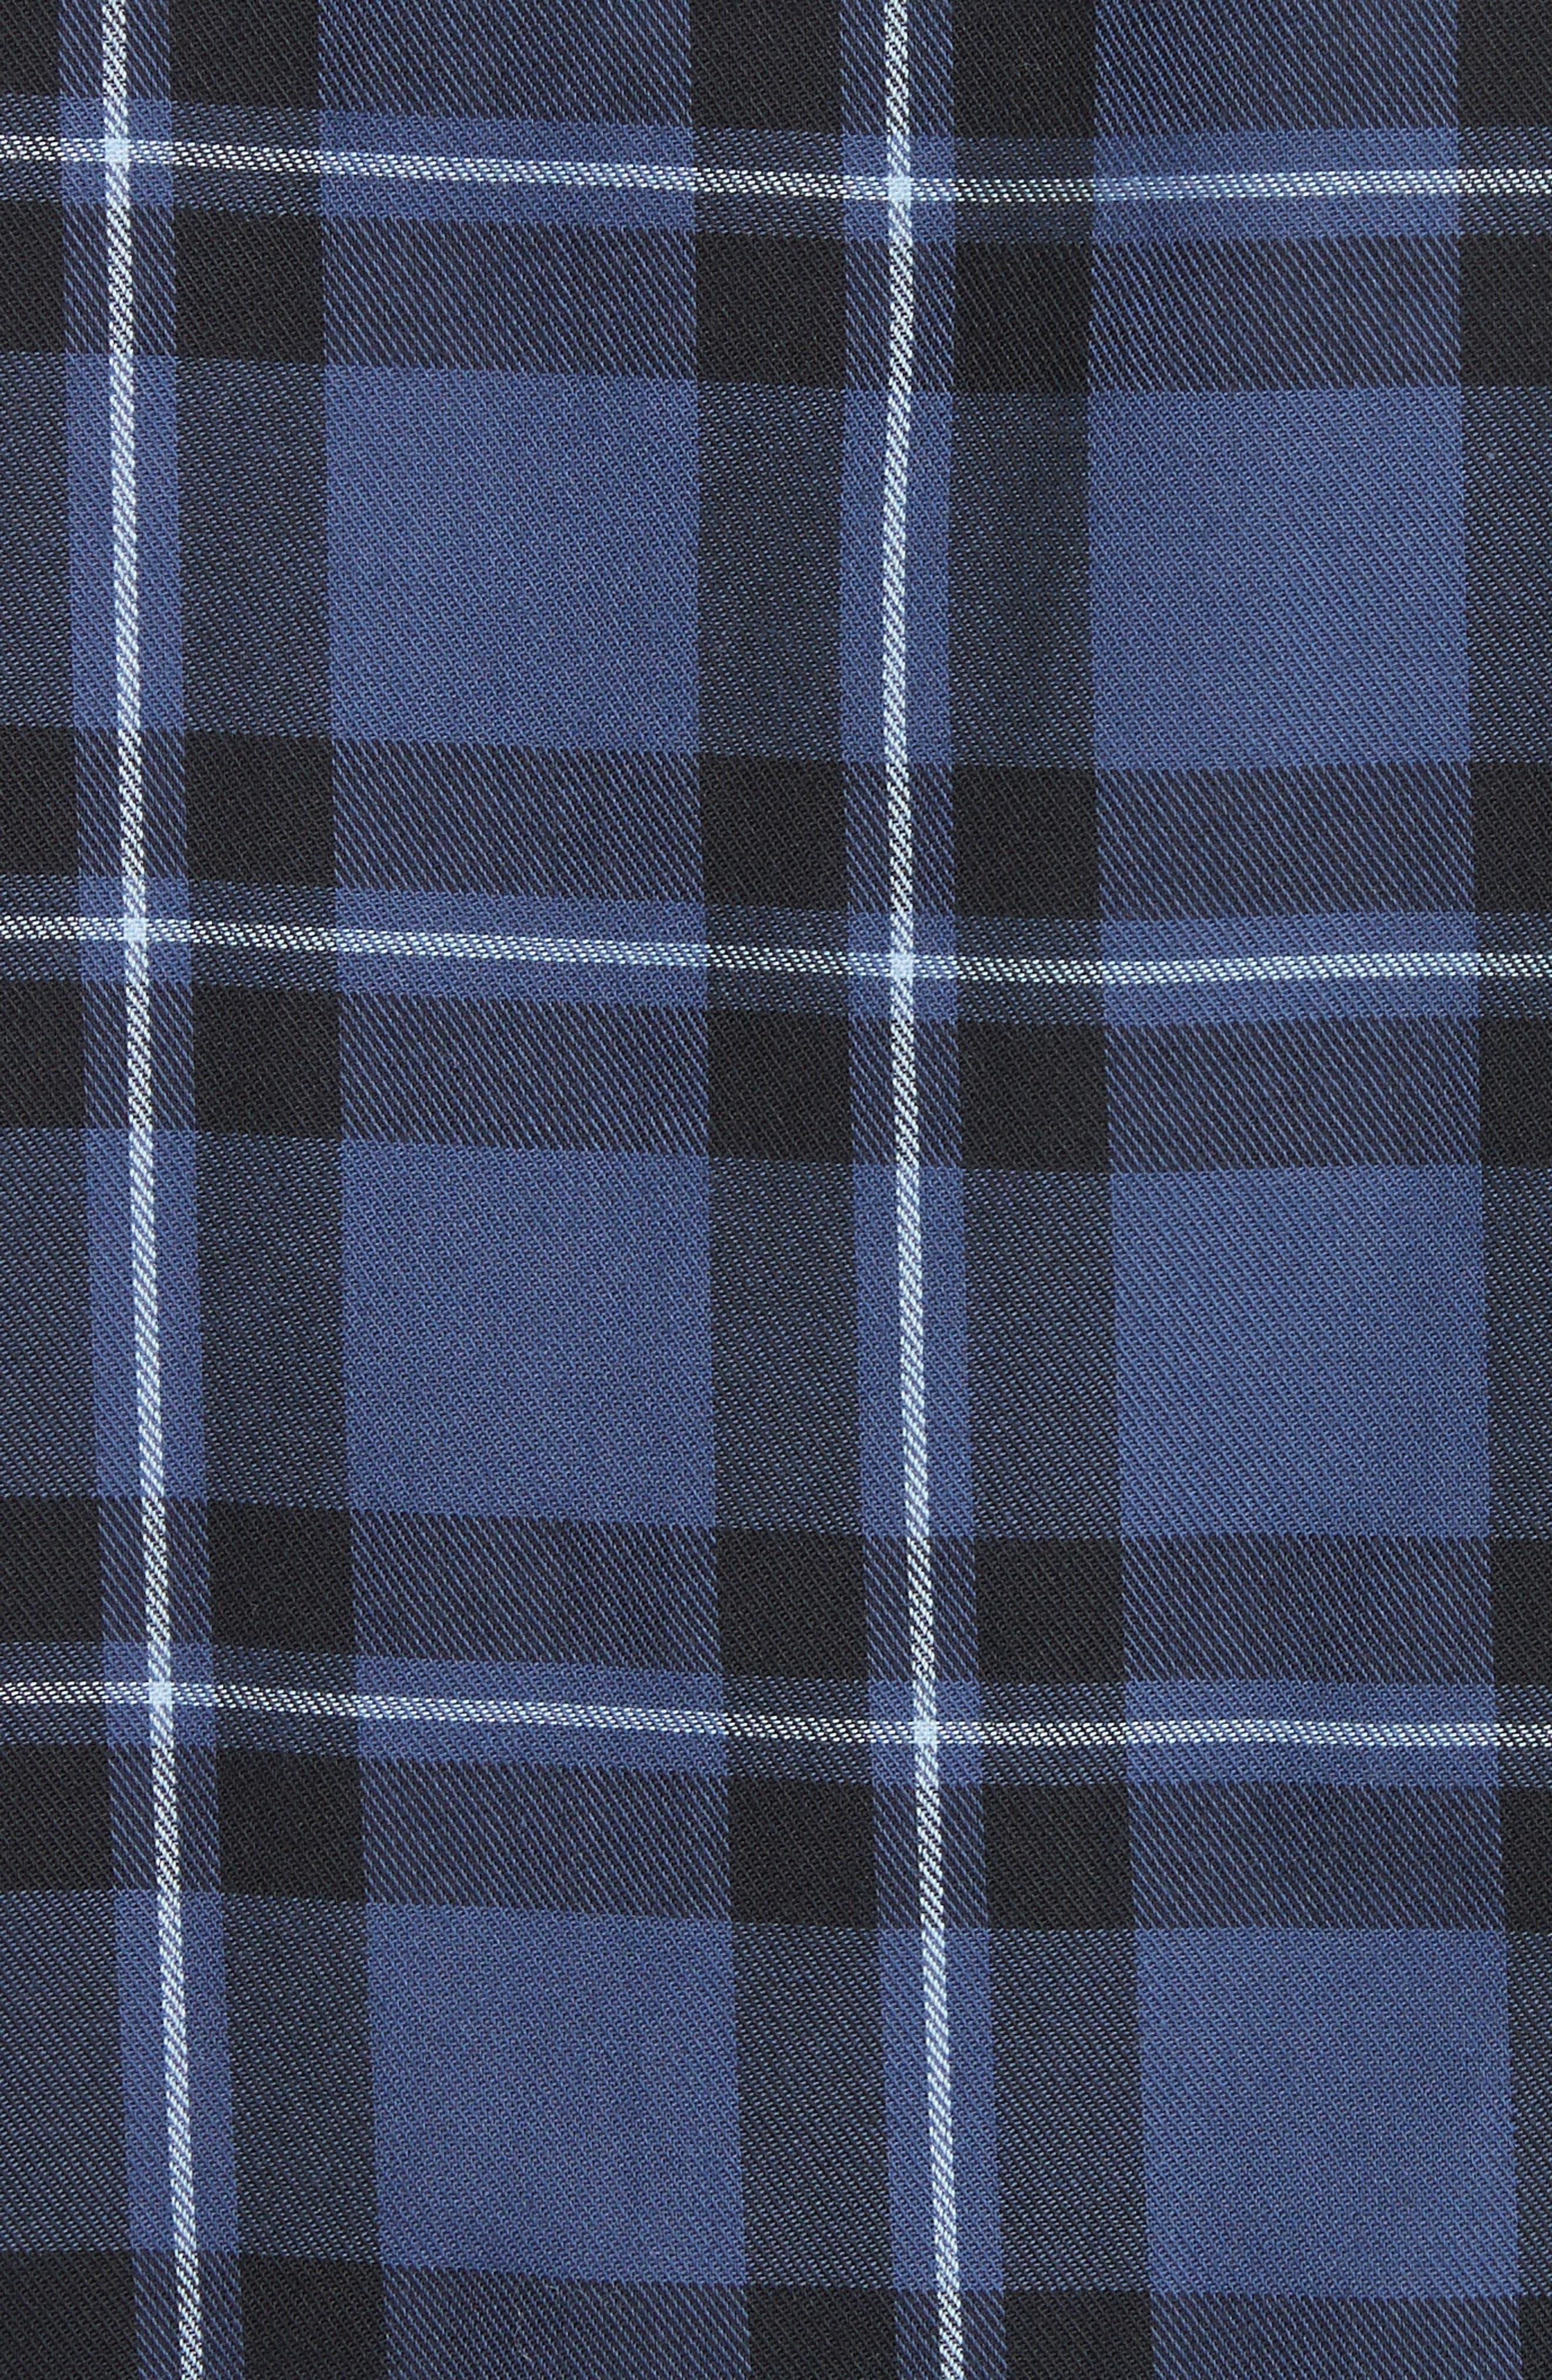 Hans Check Woven Shirt,                             Alternate thumbnail 5, color,                             410